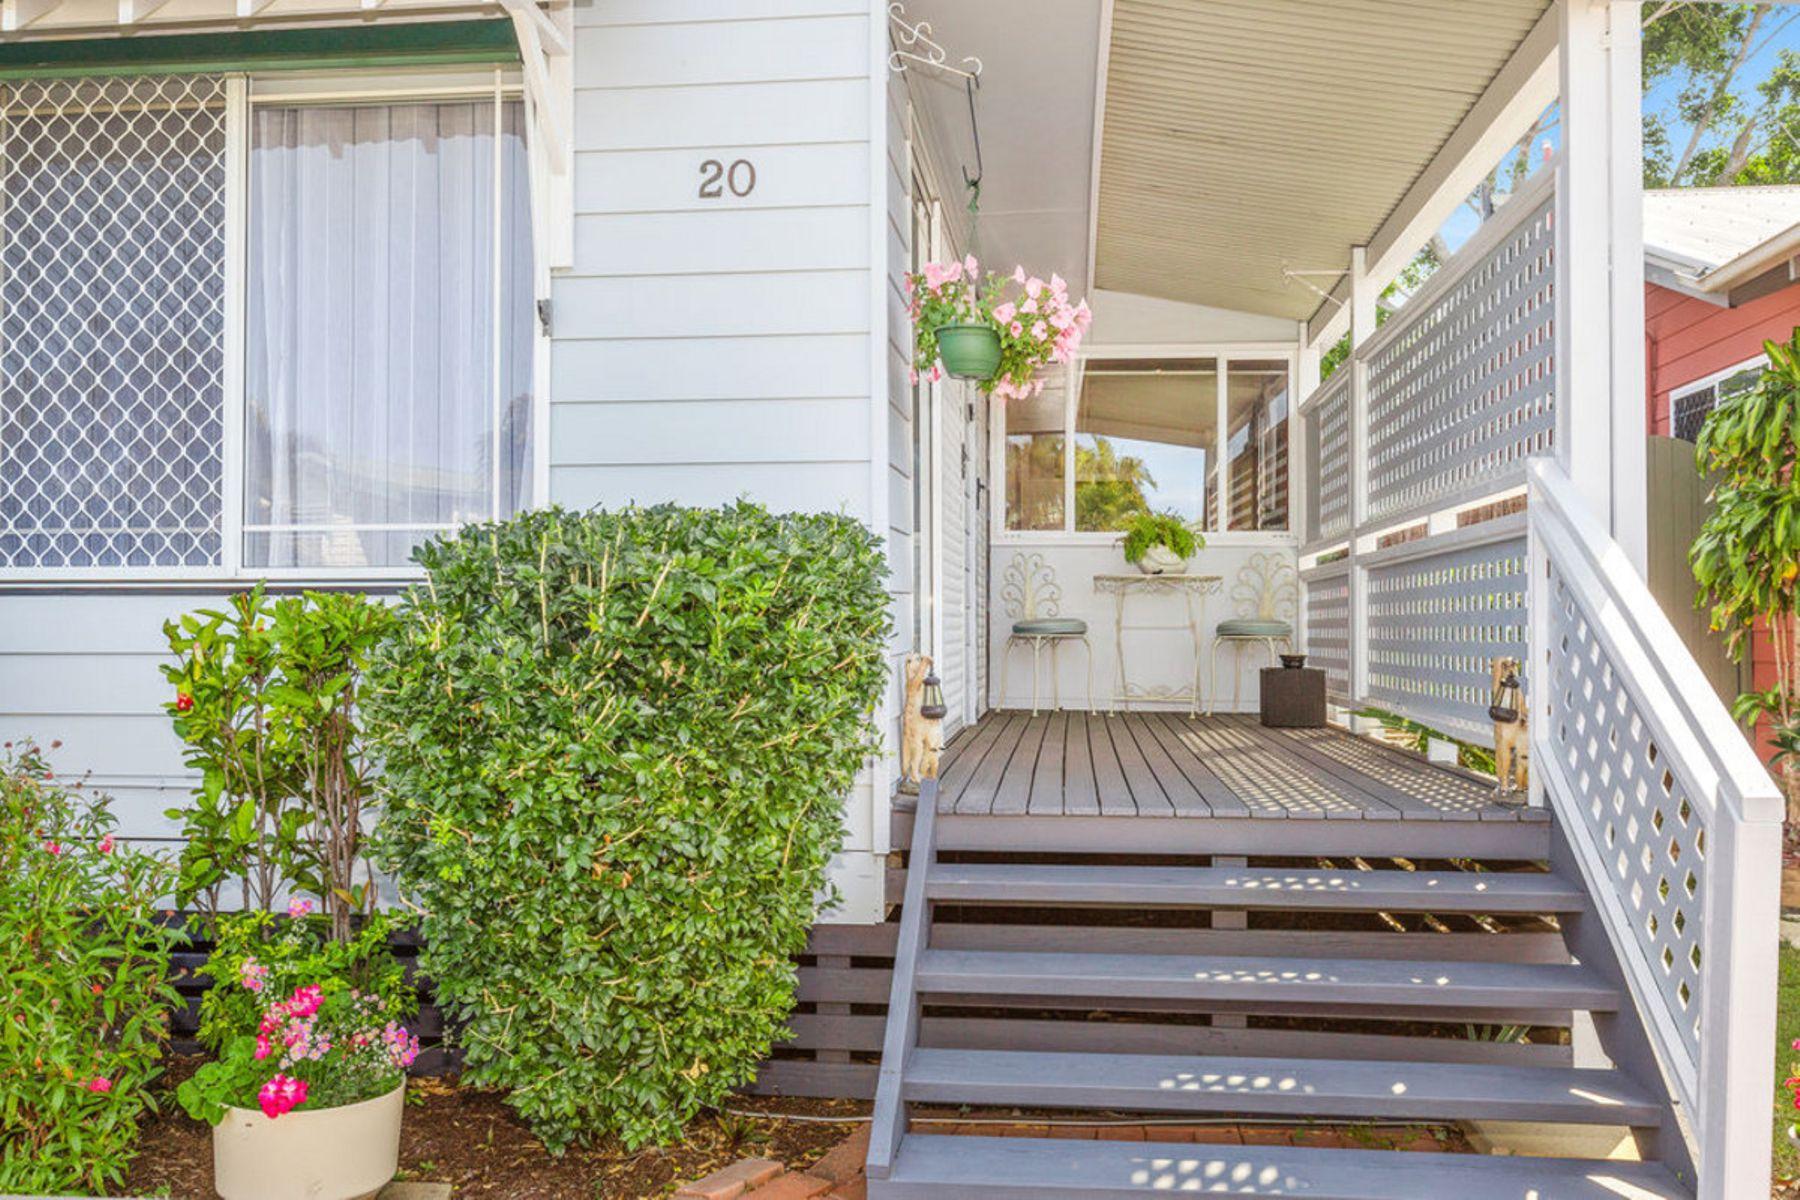 20/67 Winders Pl, Banora Point NSW 2486, Australia, Villa